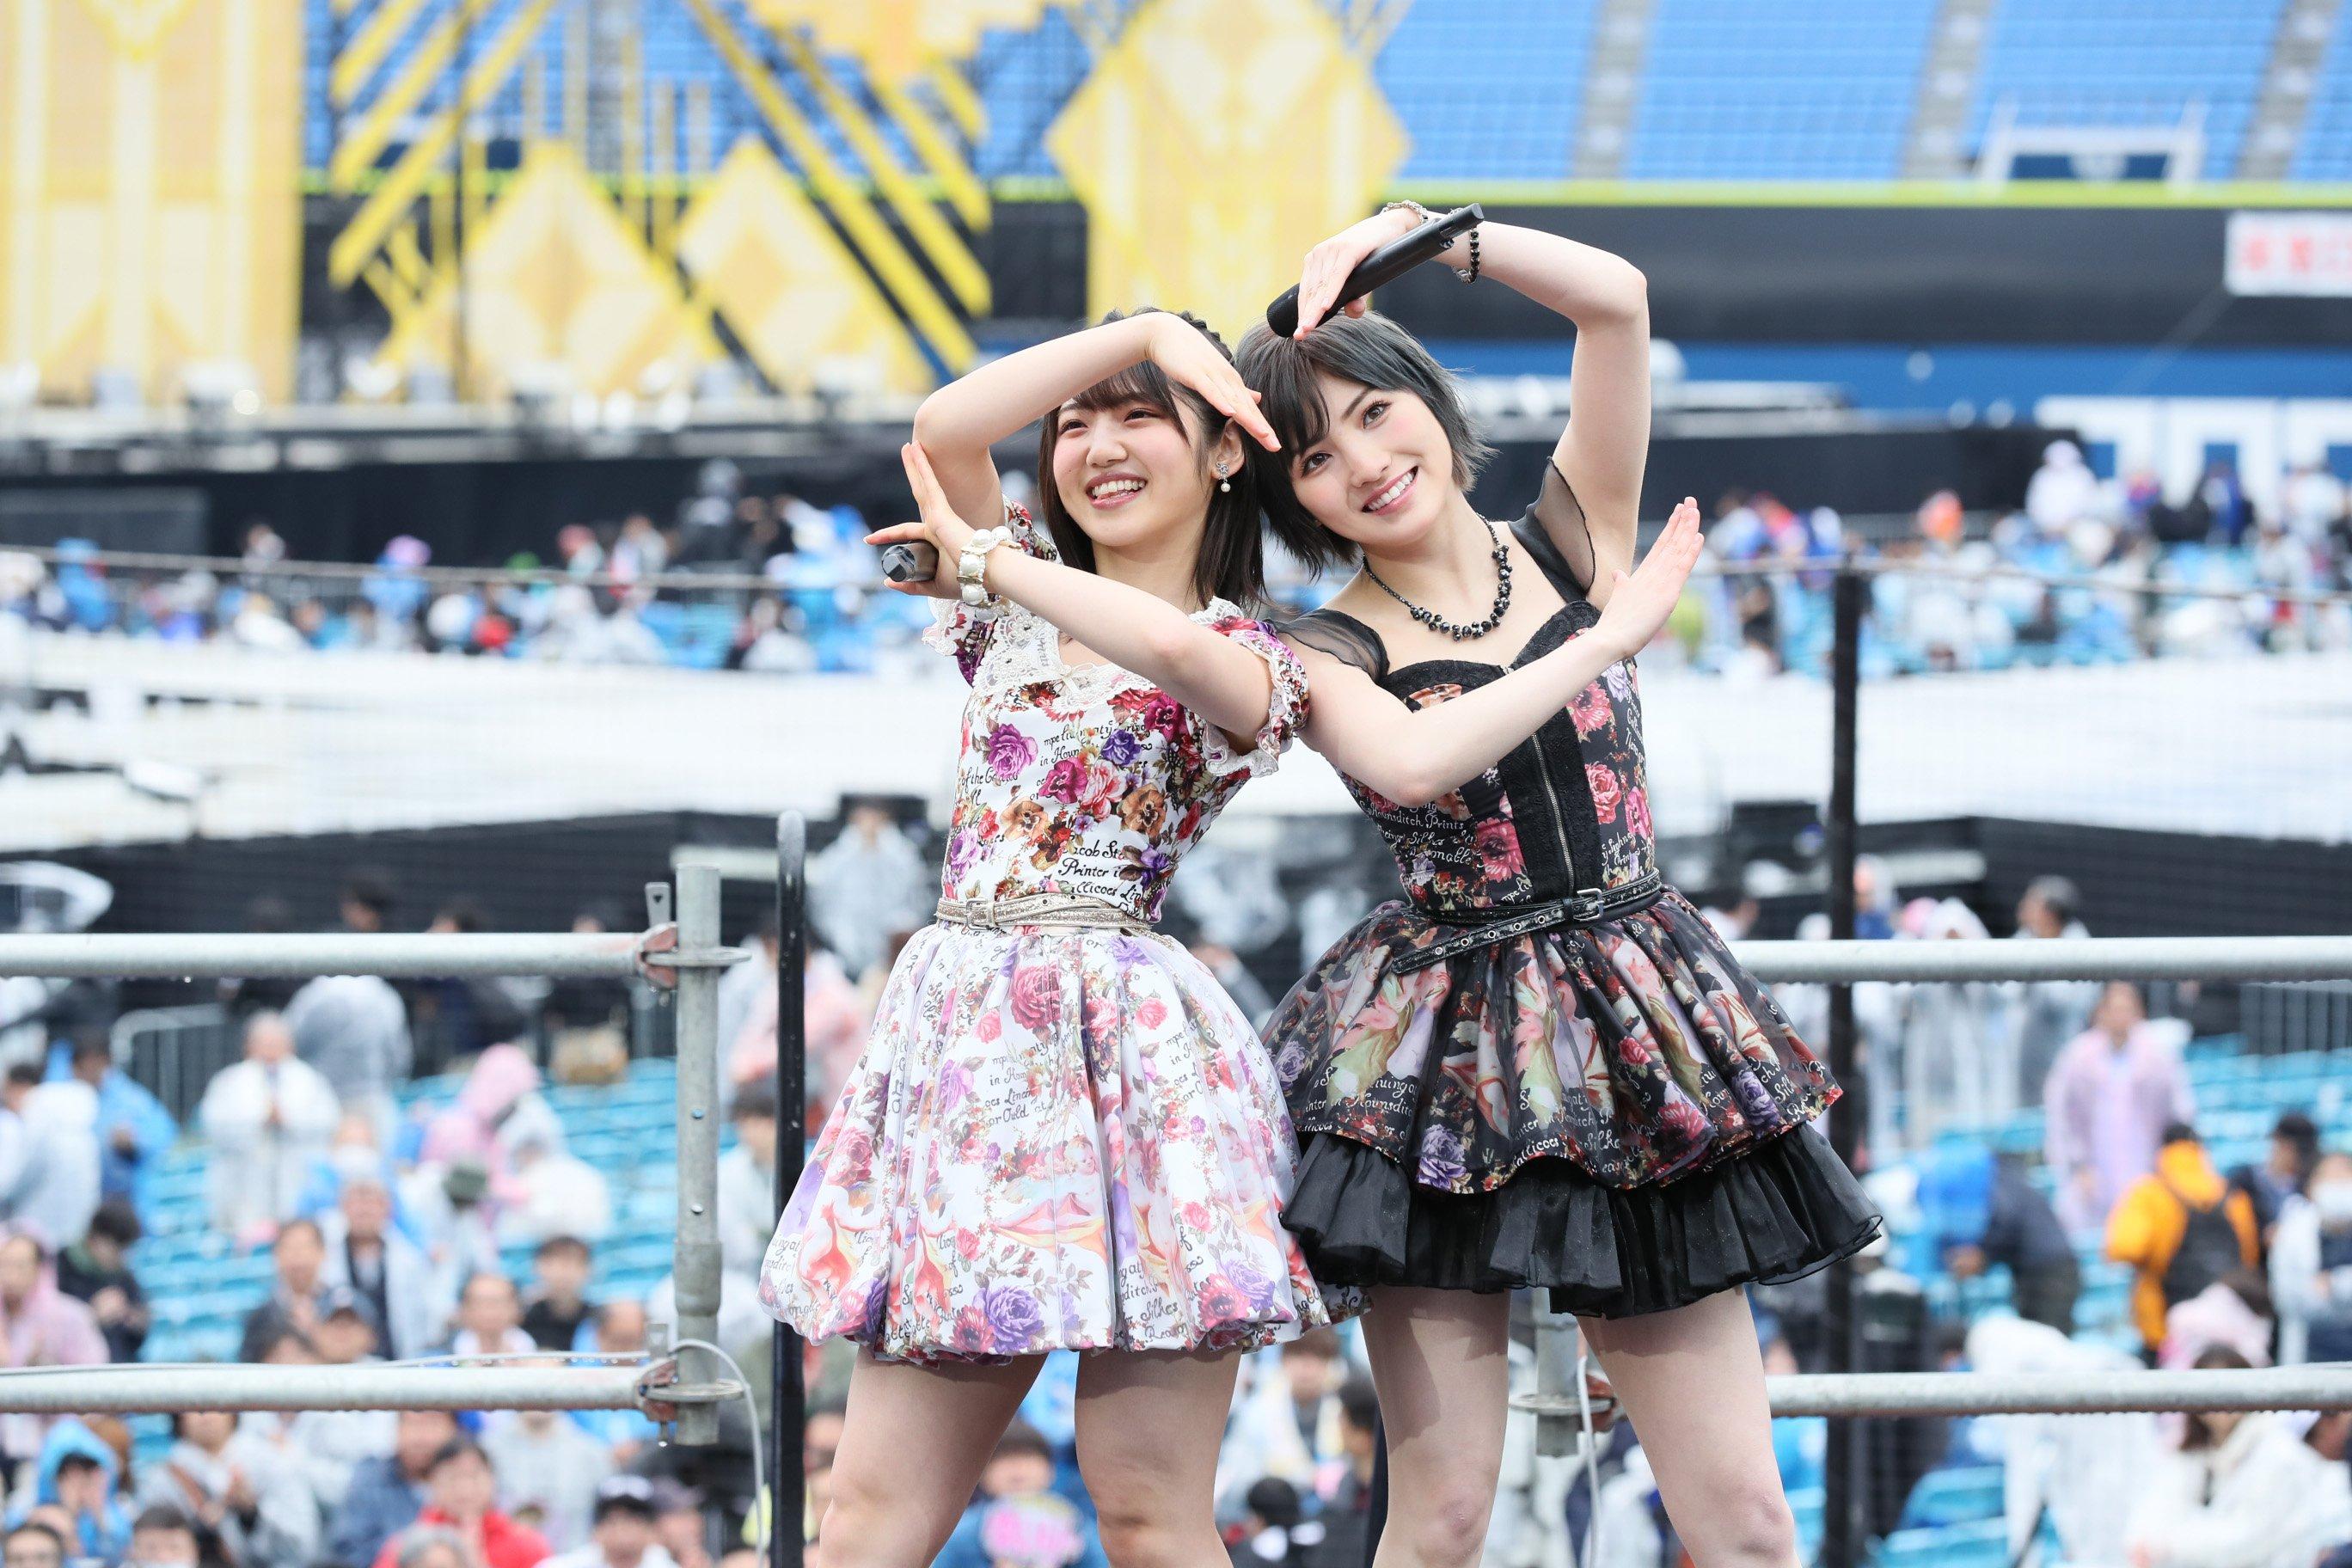 AKB48小嶋真子「笑顔で卒業」AKB48フェスのトリを飾る【写真19枚】の画像008